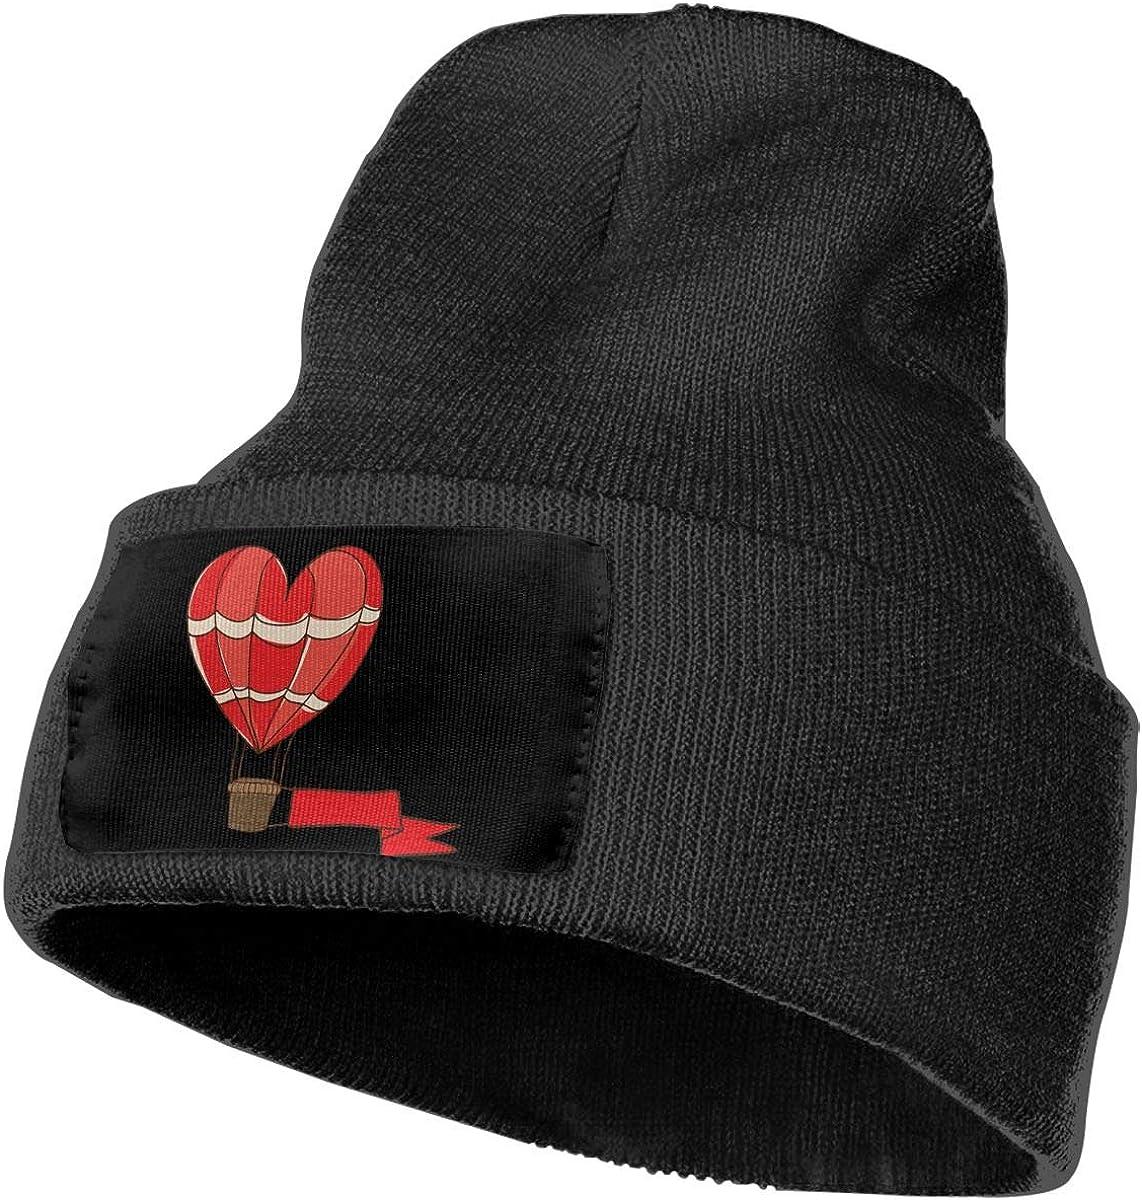 Mens and Womens 100/% Acrylic Knitting Hat Cap Heart Shape Hot Air Balloon Fashion Skull Beanie